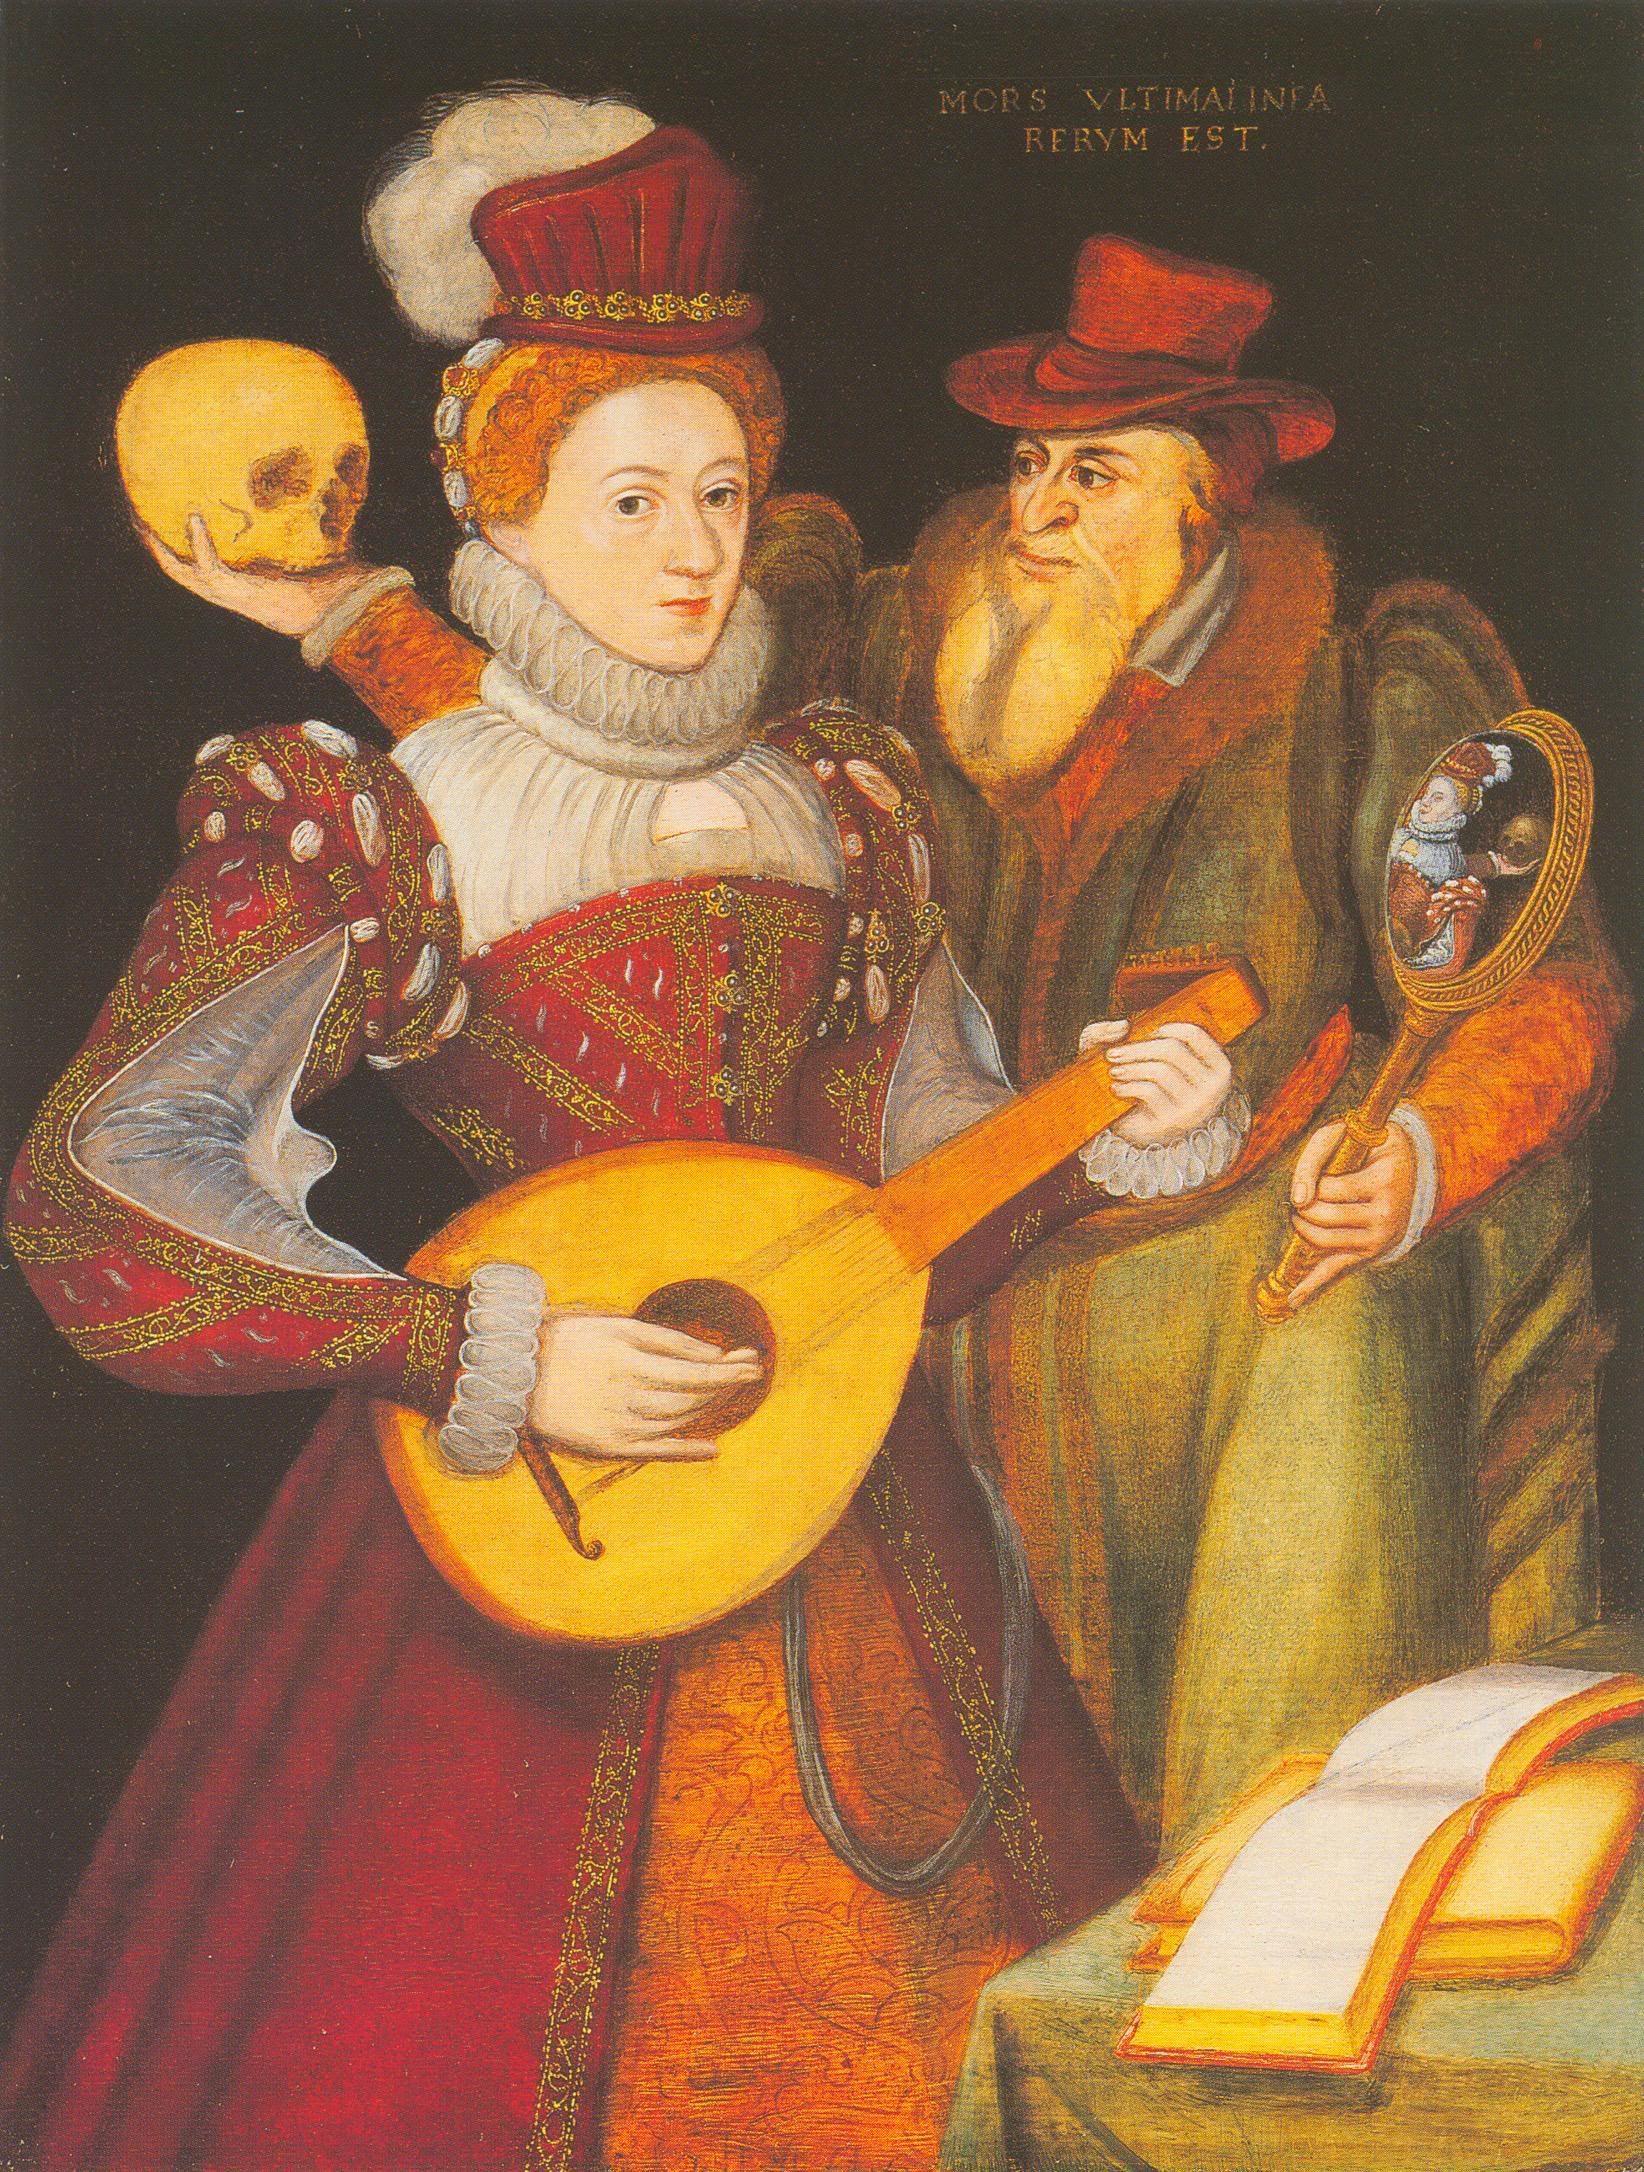 1570 Elizabeth I of England Renaissance fashion, 16th